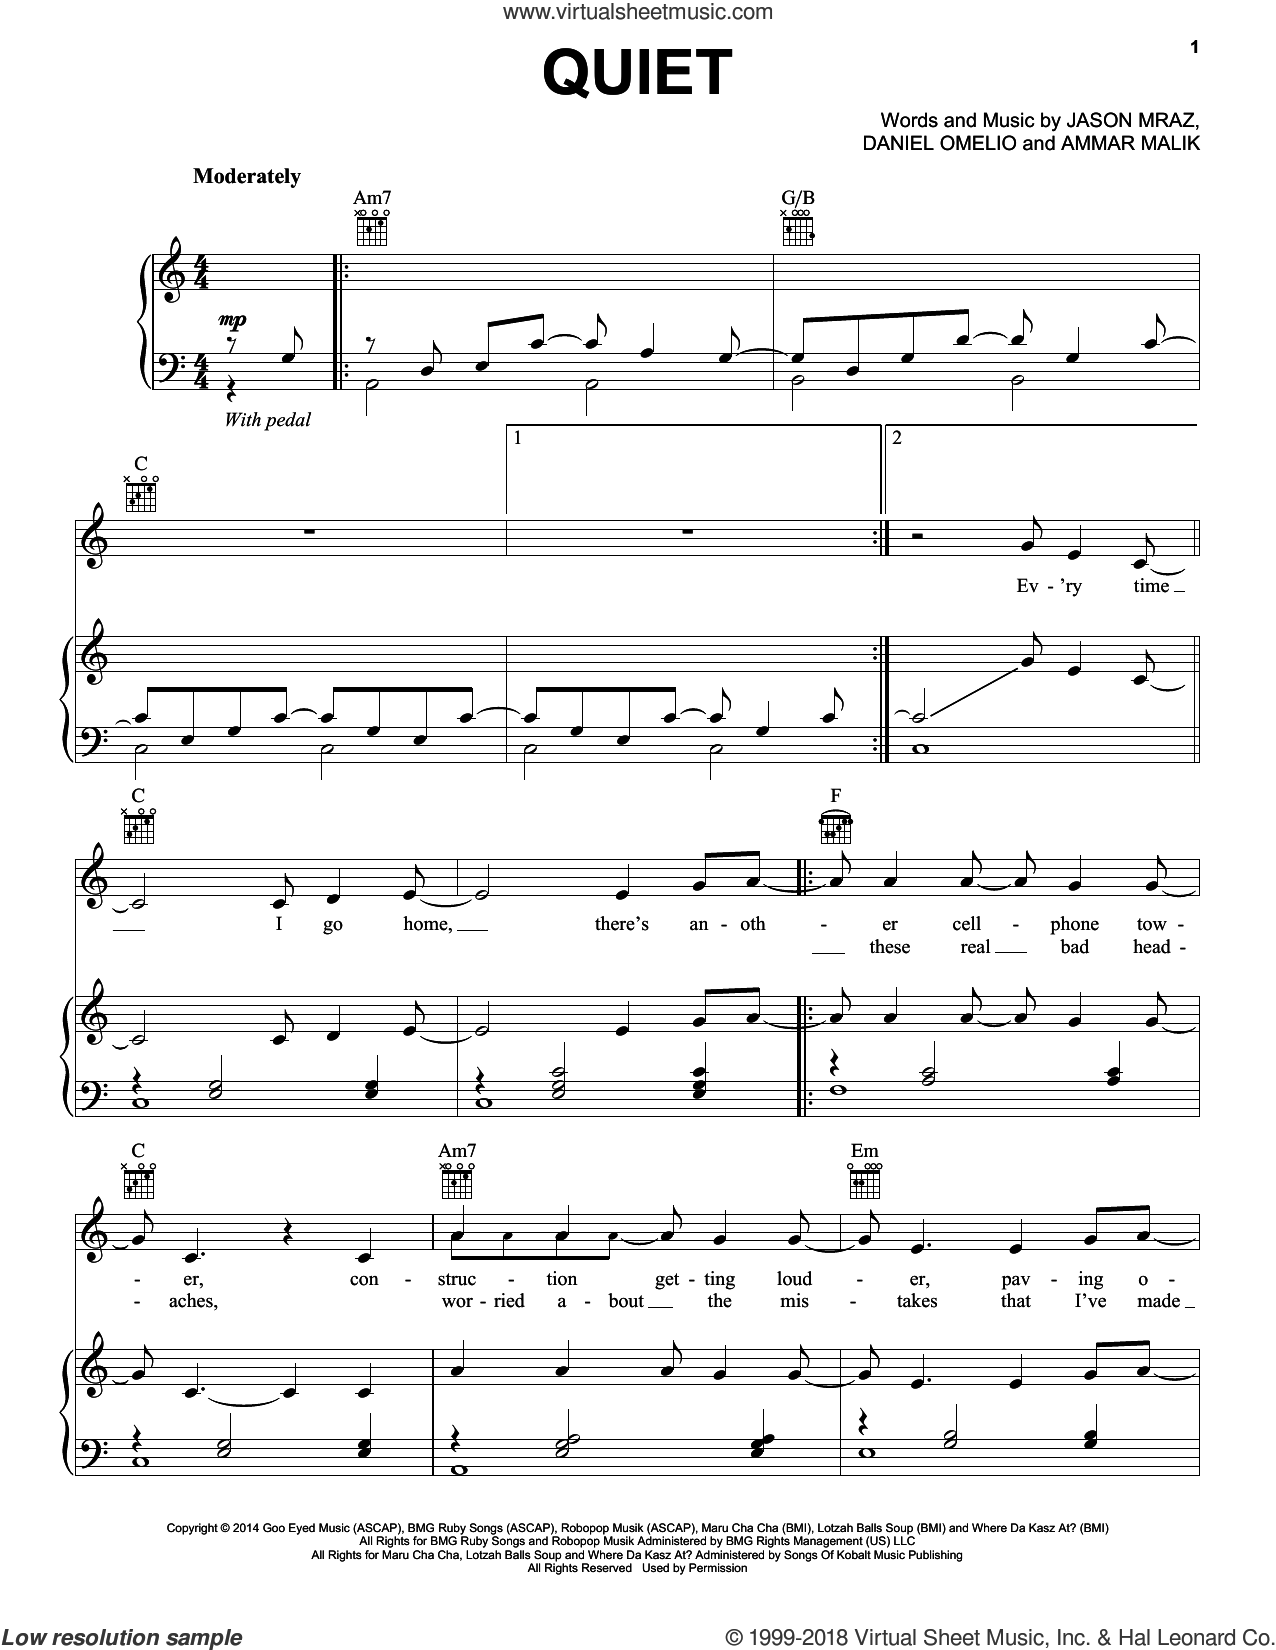 Quiet sheet music for voice, piano or guitar by Jason Mraz, Ammar Malik and Daniel Omelio, intermediate skill level